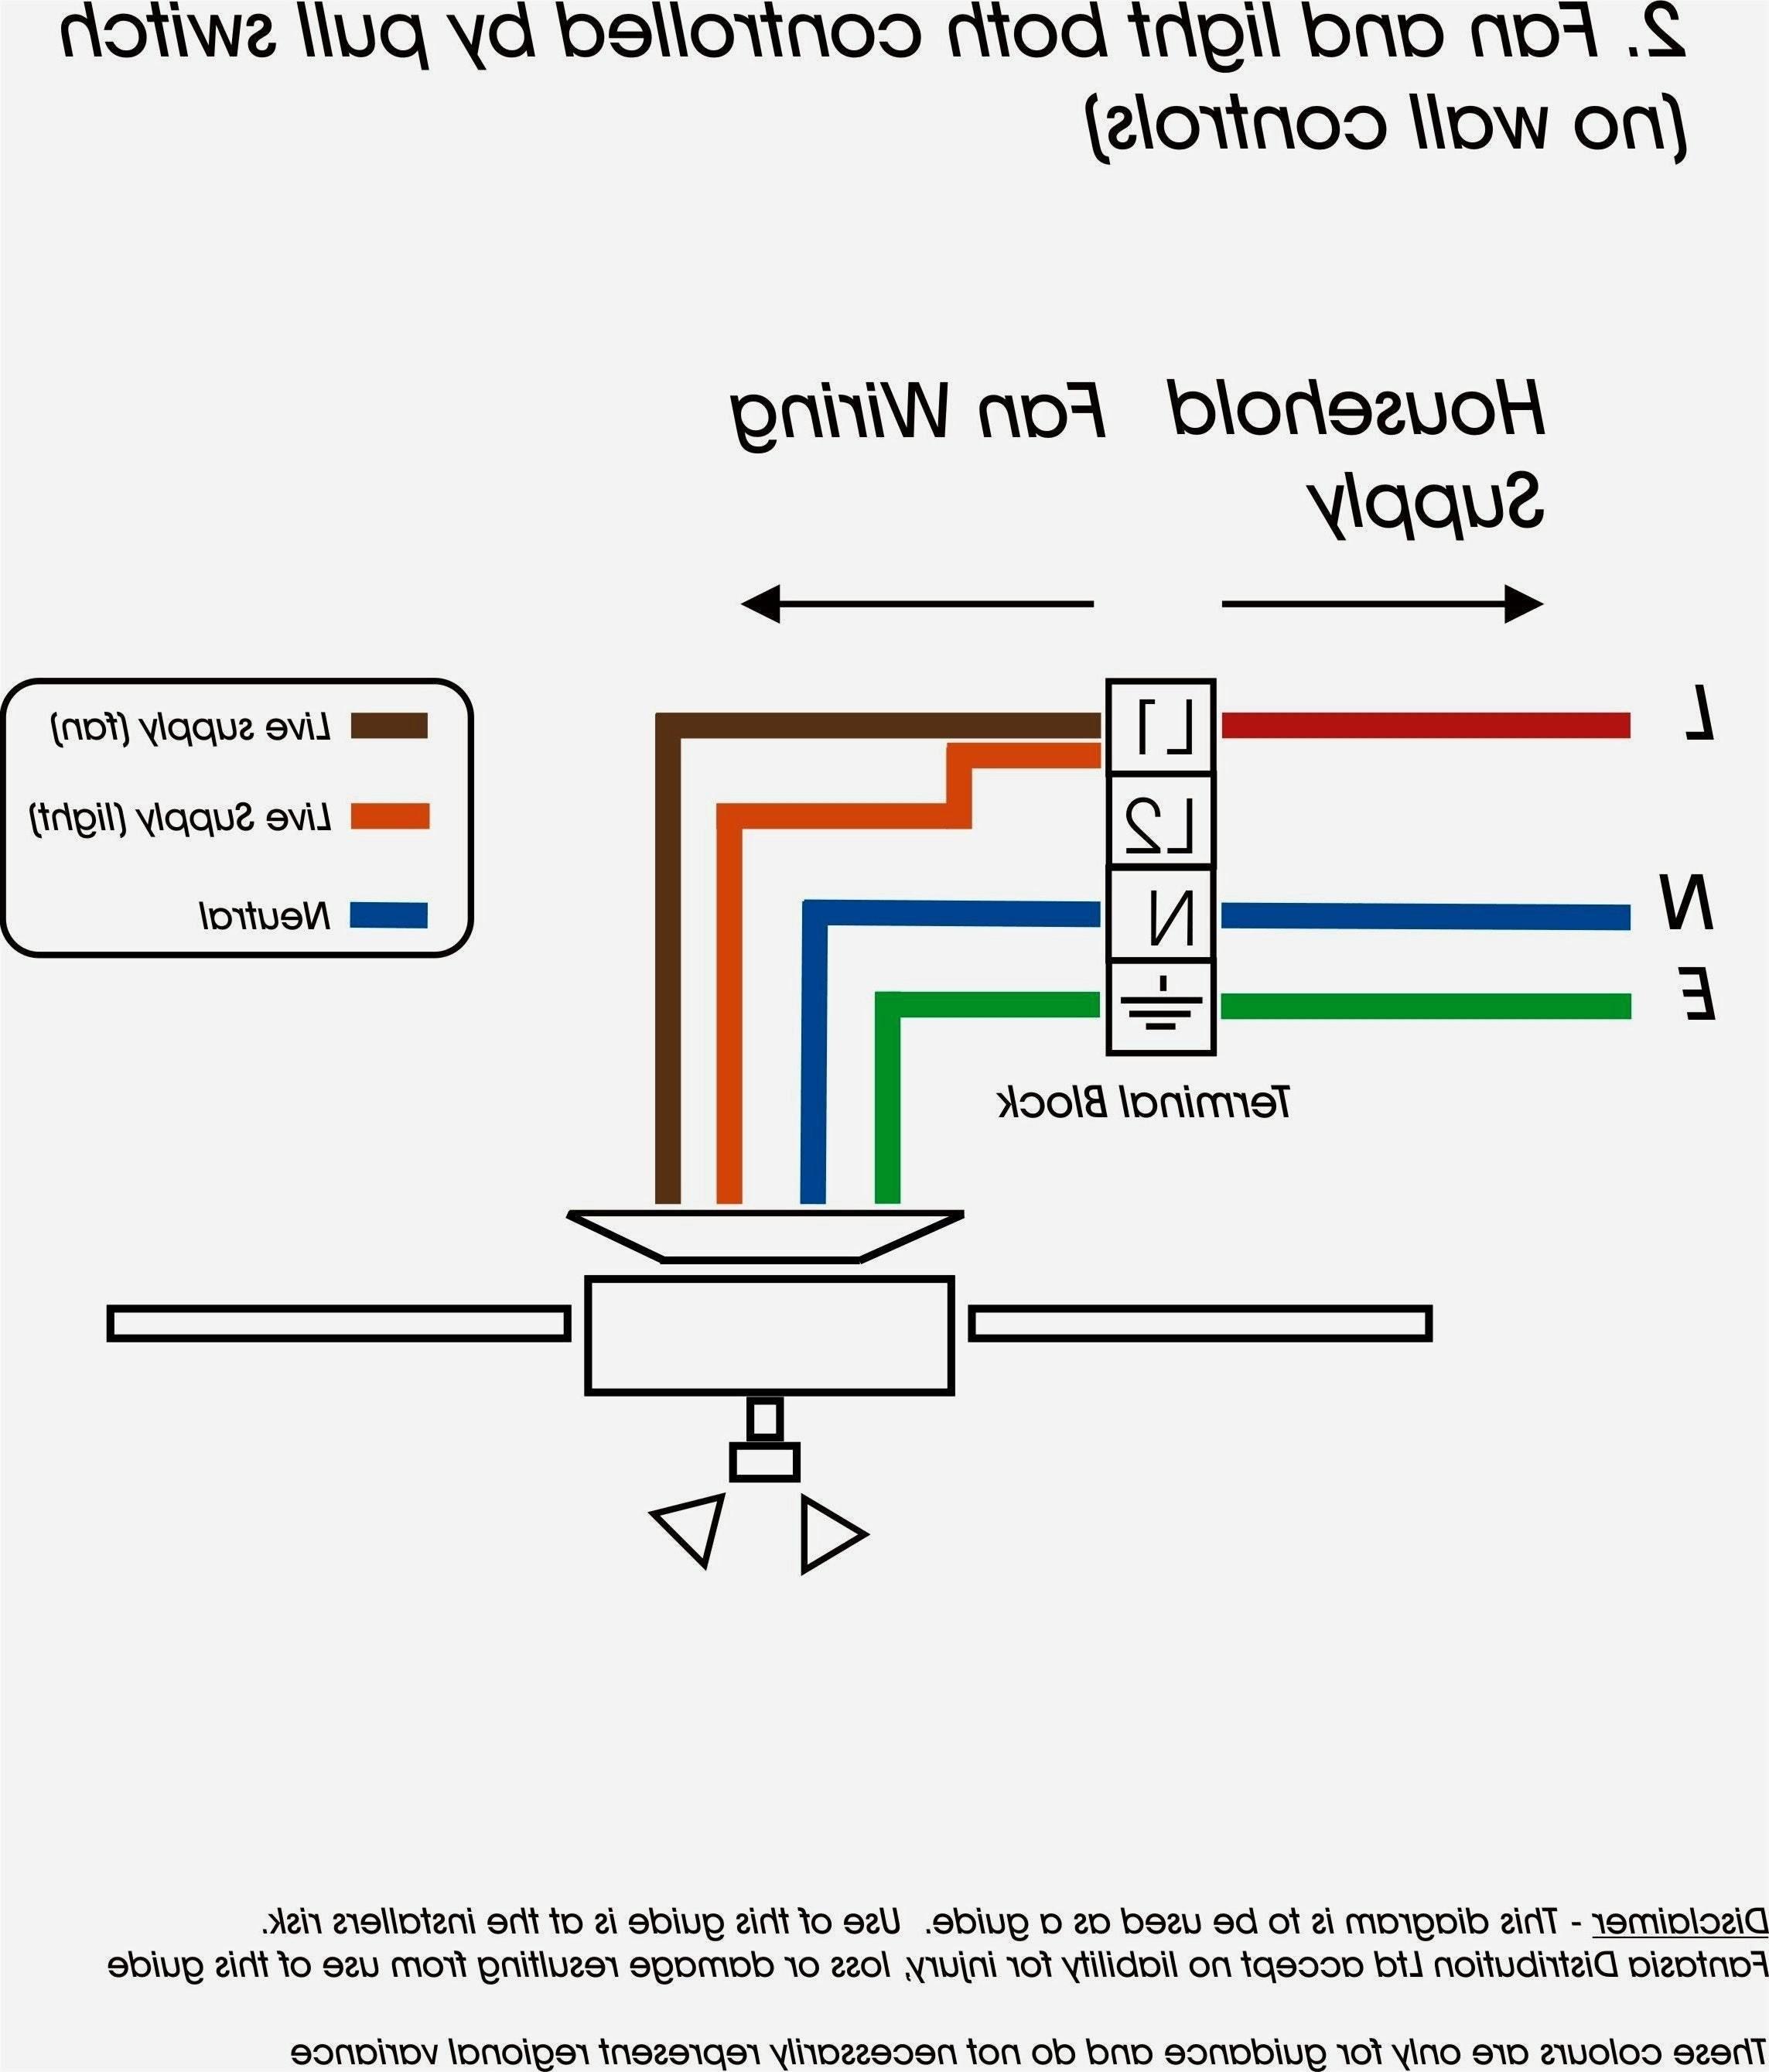 cooper 3 way dimmer switch wiring diagram Collection 5 Way Switch Wiring Diagram Inspiration Wiring